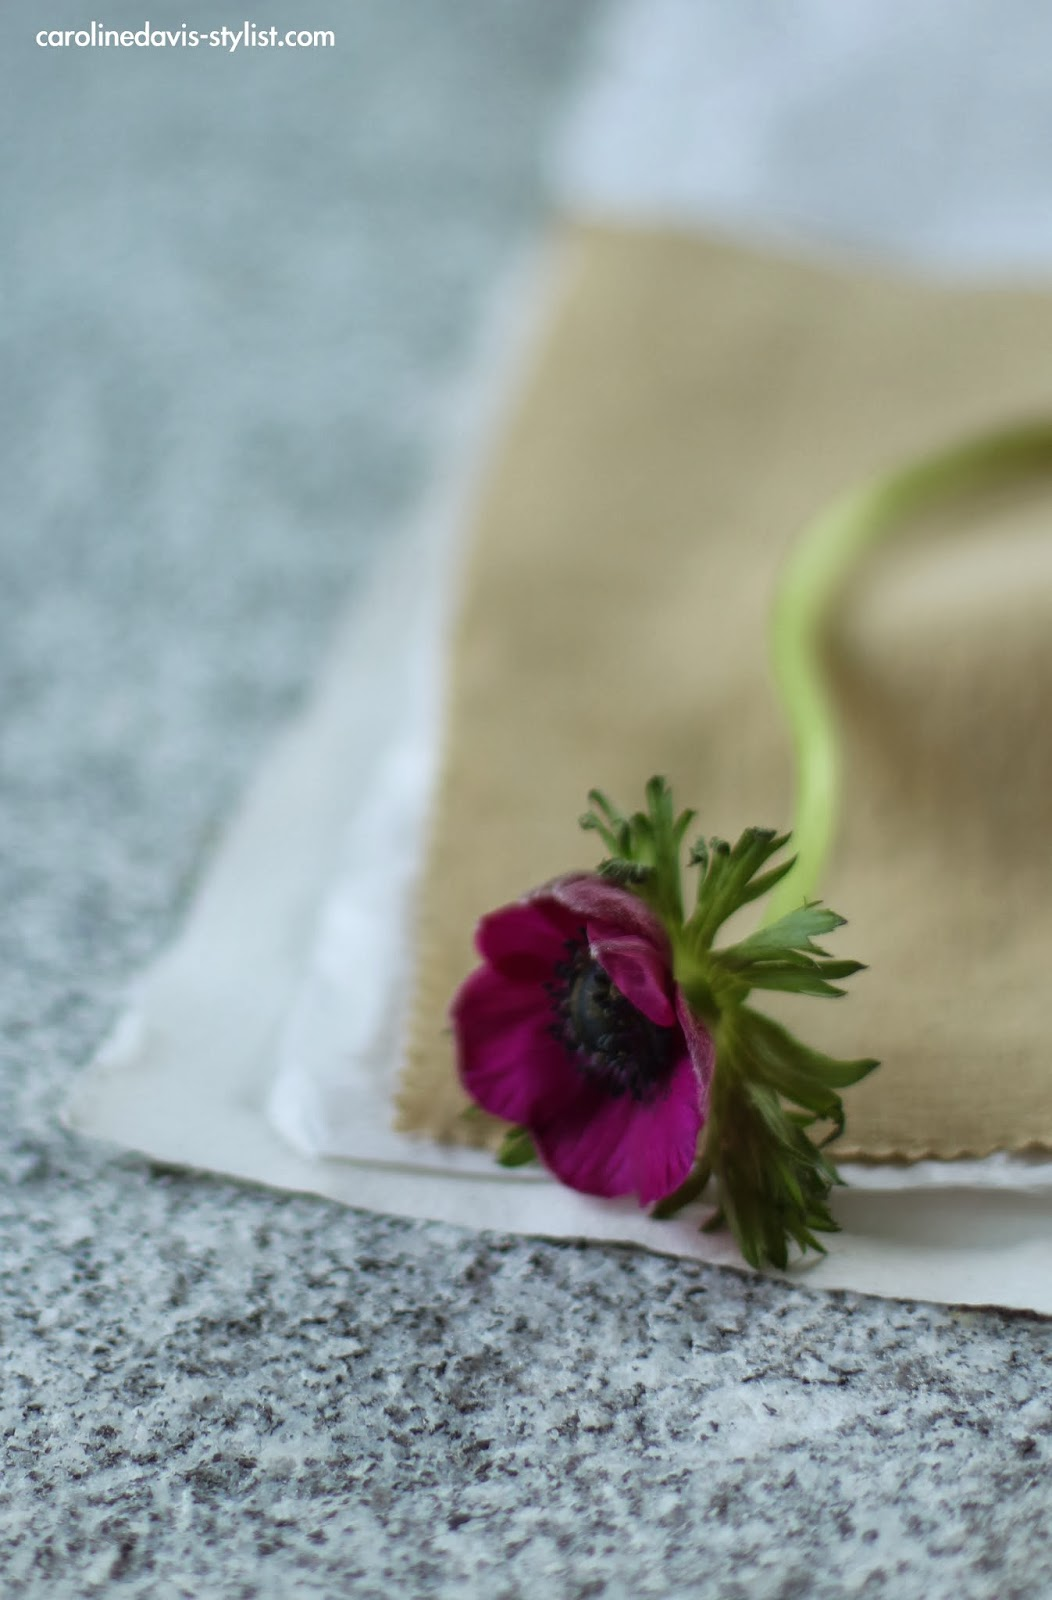 flowers, carolinedavis-stylist.com, trend-daily blog, styling details